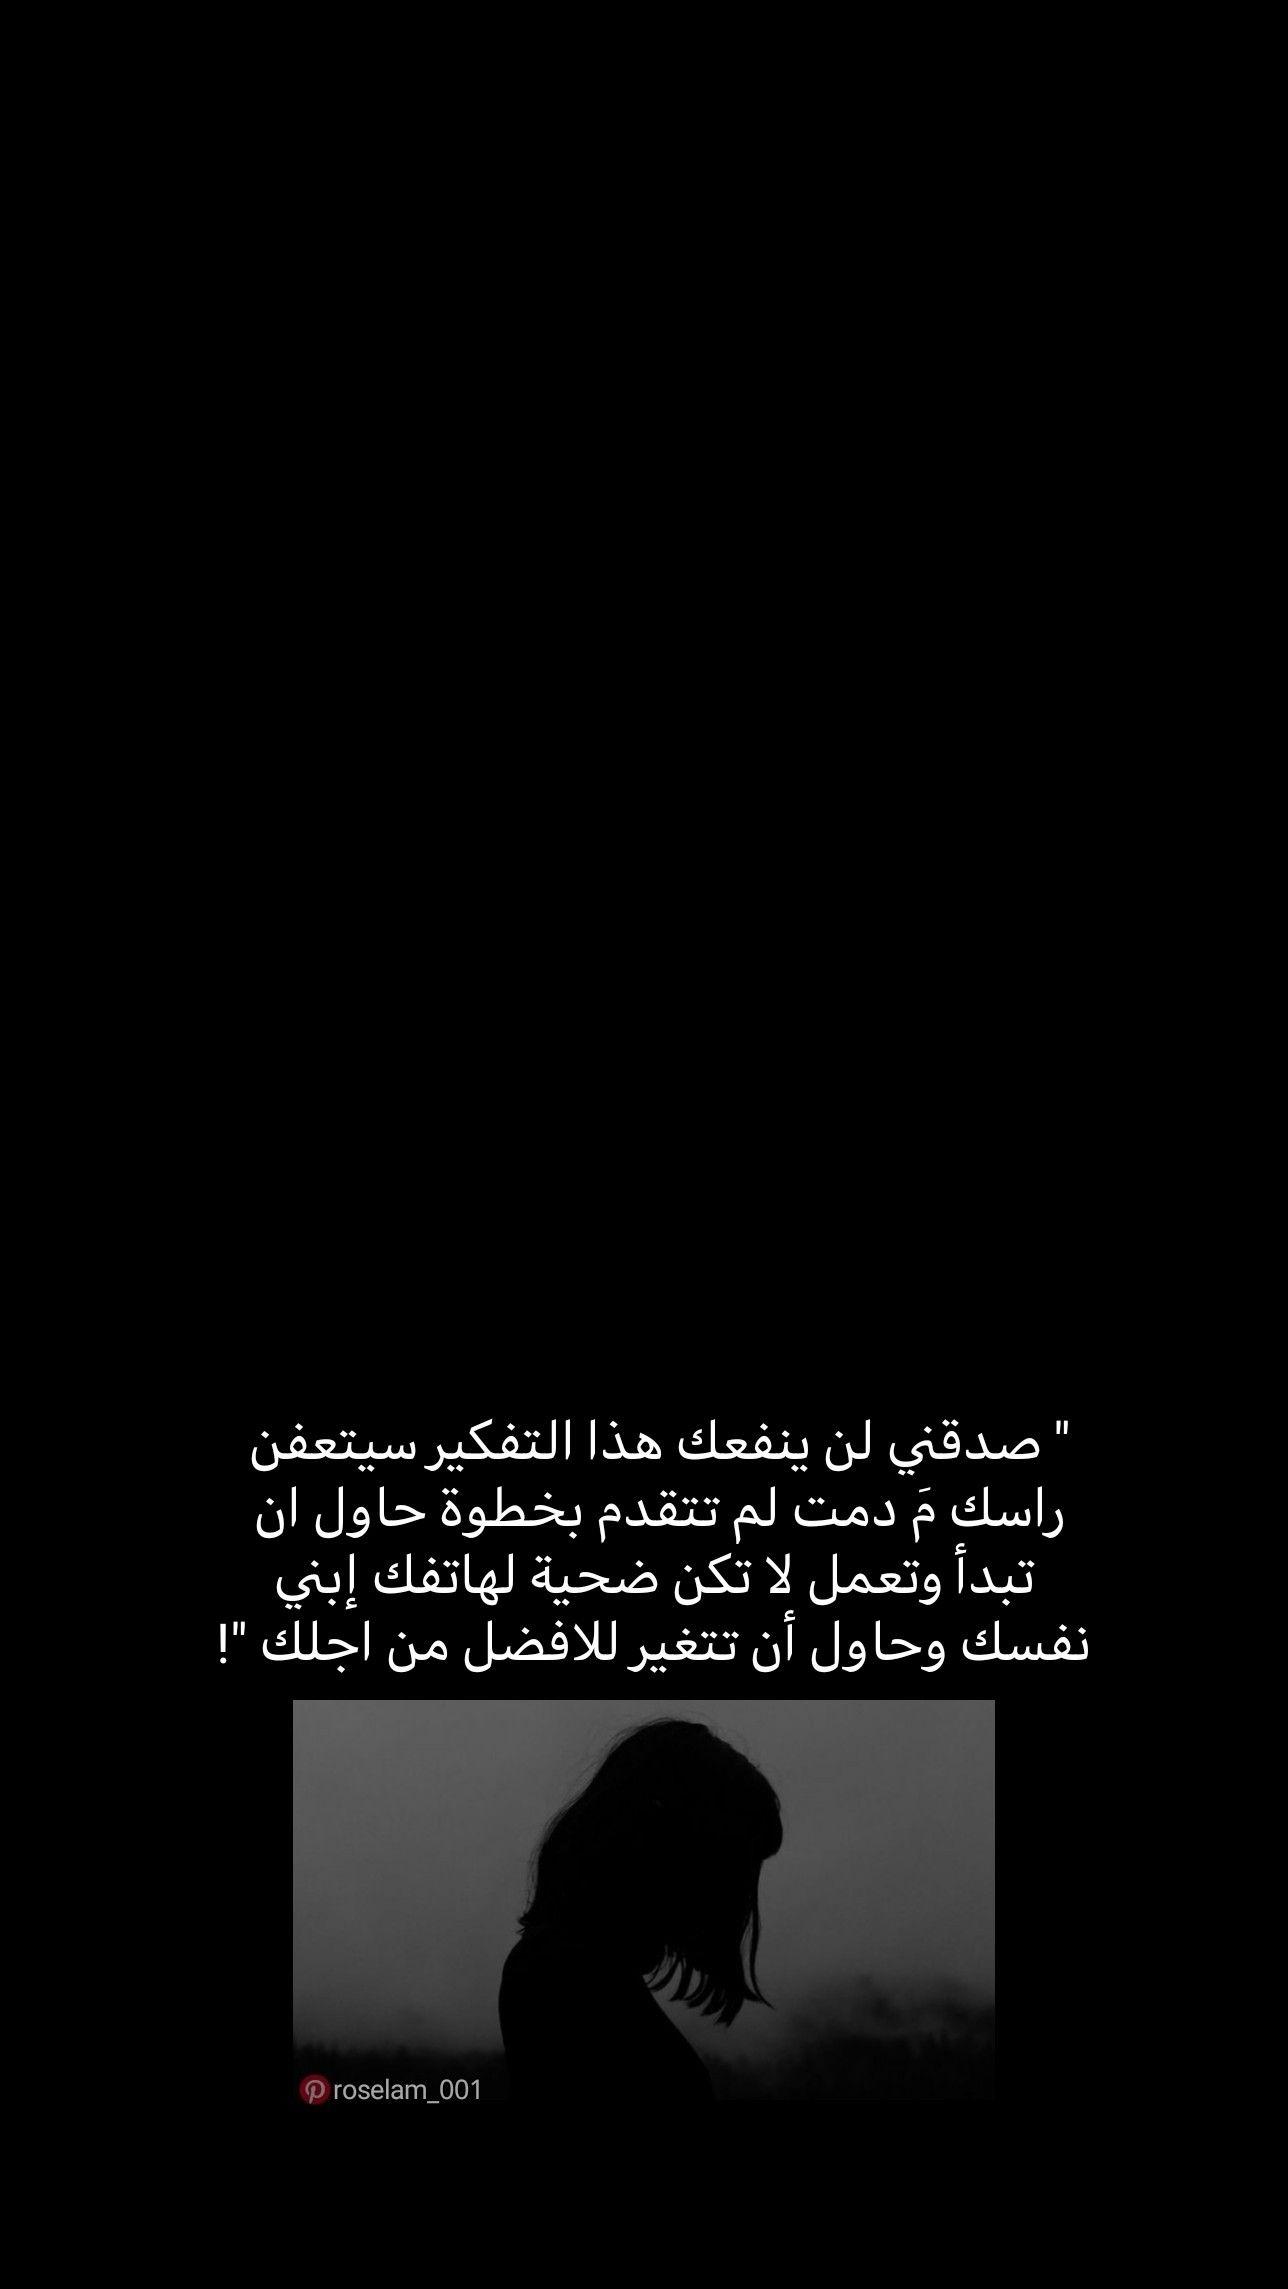 Pin By ر س ل On تداول Funny Arabic Quotes Cool Girl Pic Homescreen Wallpaper